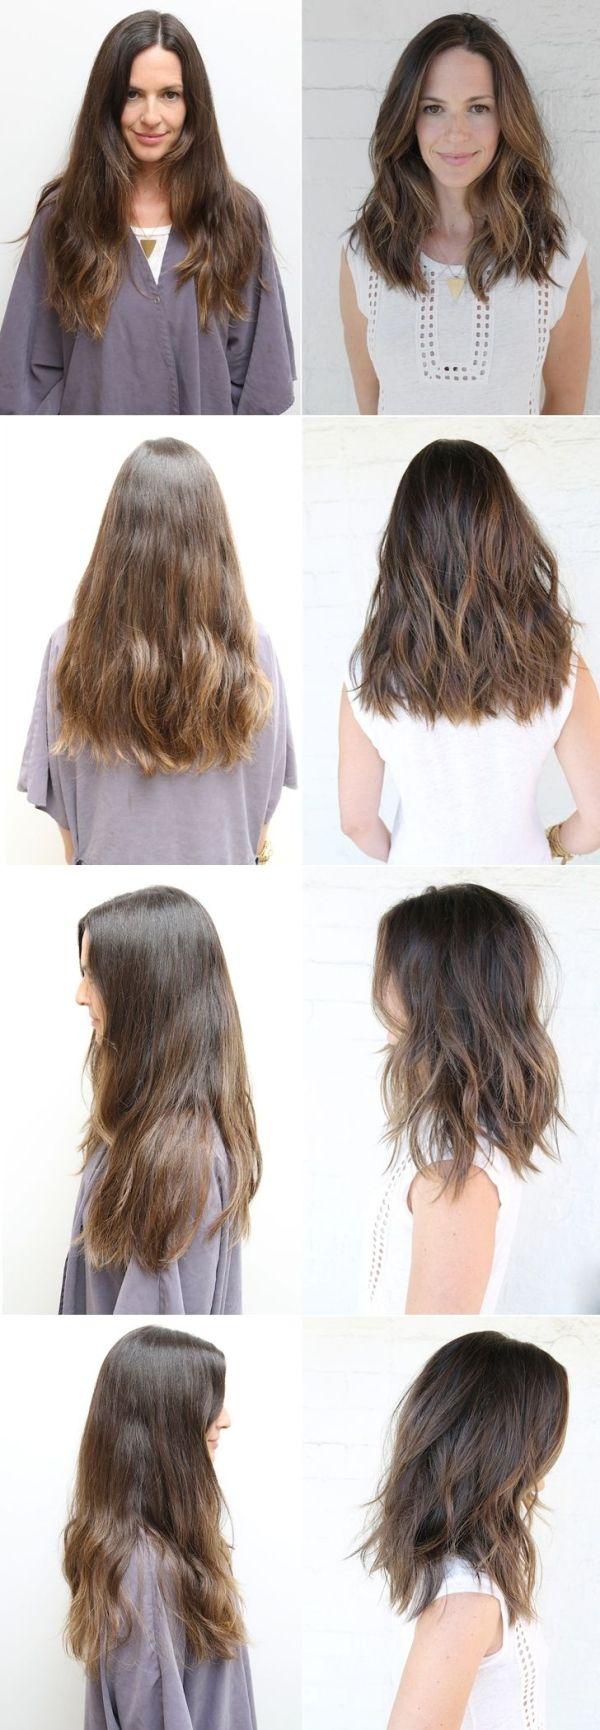 Remarkable 1000 Ideas About Medium Long Haircuts On Pinterest Medium Long Short Hairstyles For Black Women Fulllsitofus